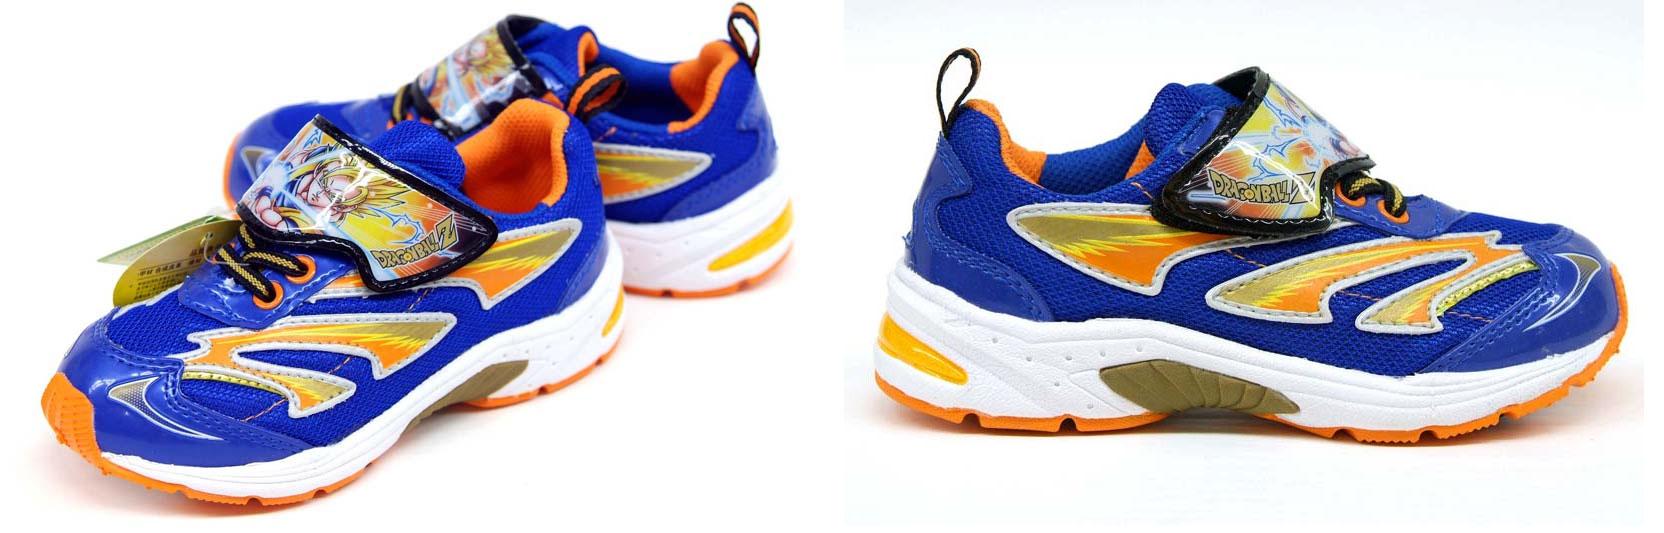 Chaussures enfant Dragon Ball